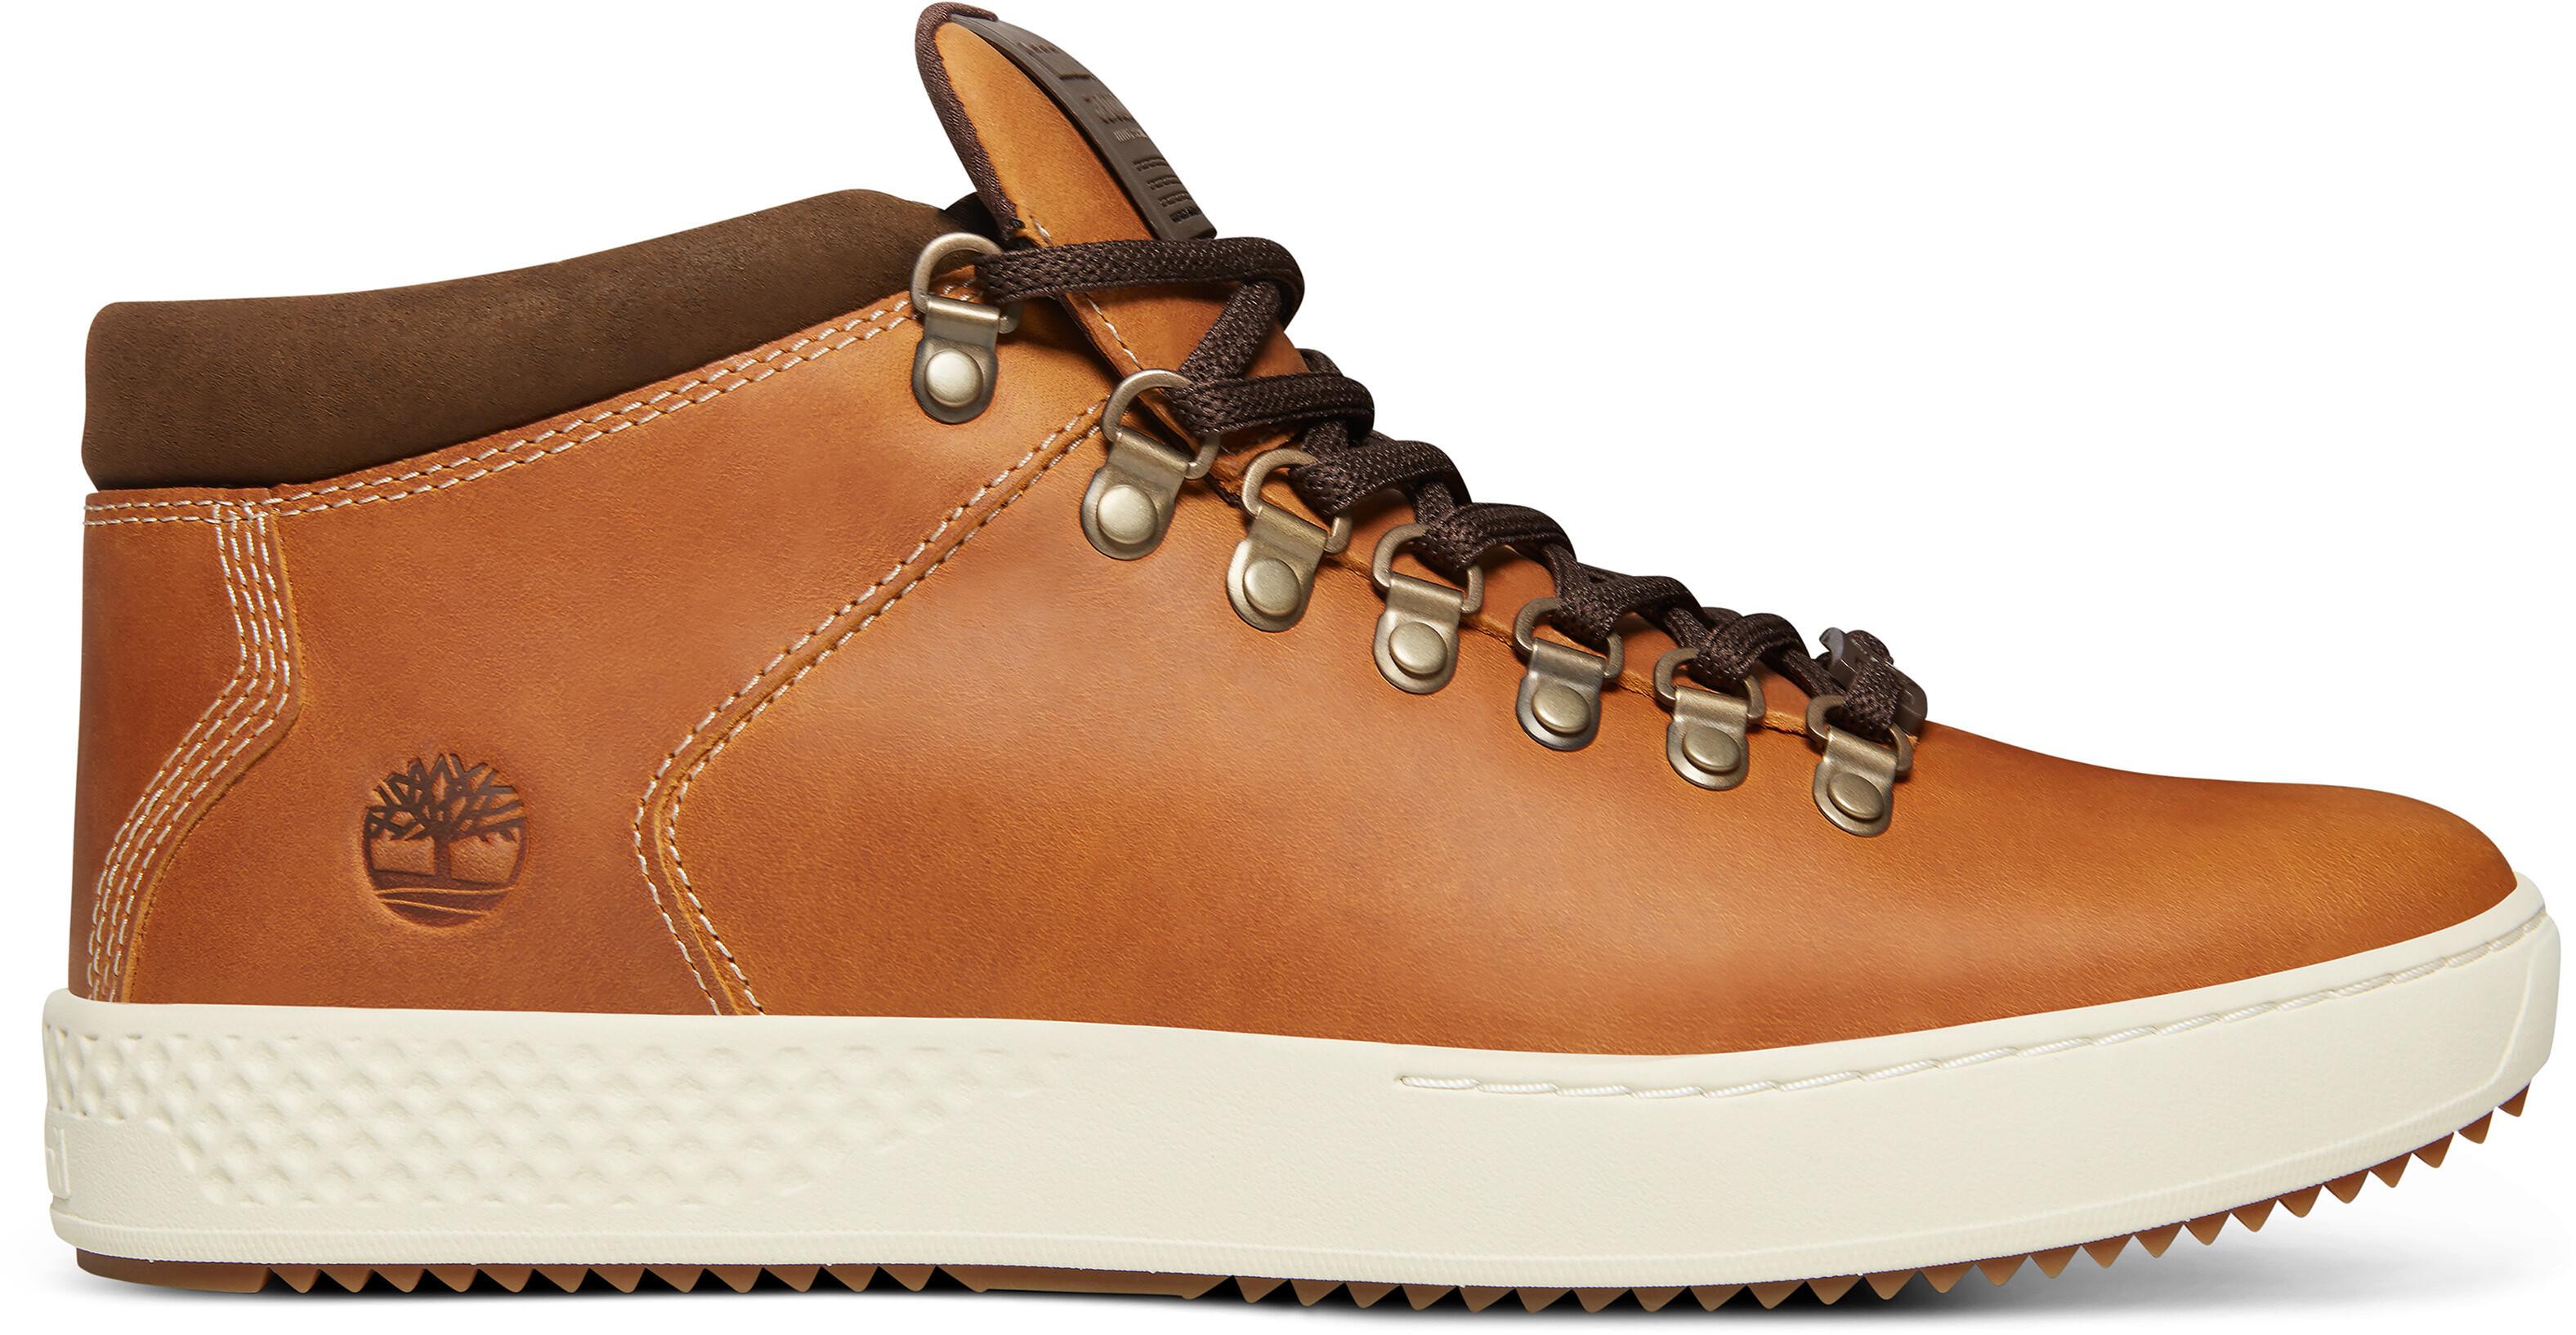 3432f78b8e9 Timberland CityRoam Cupsole - Chaussures Homme - beige sur CAMPZ !